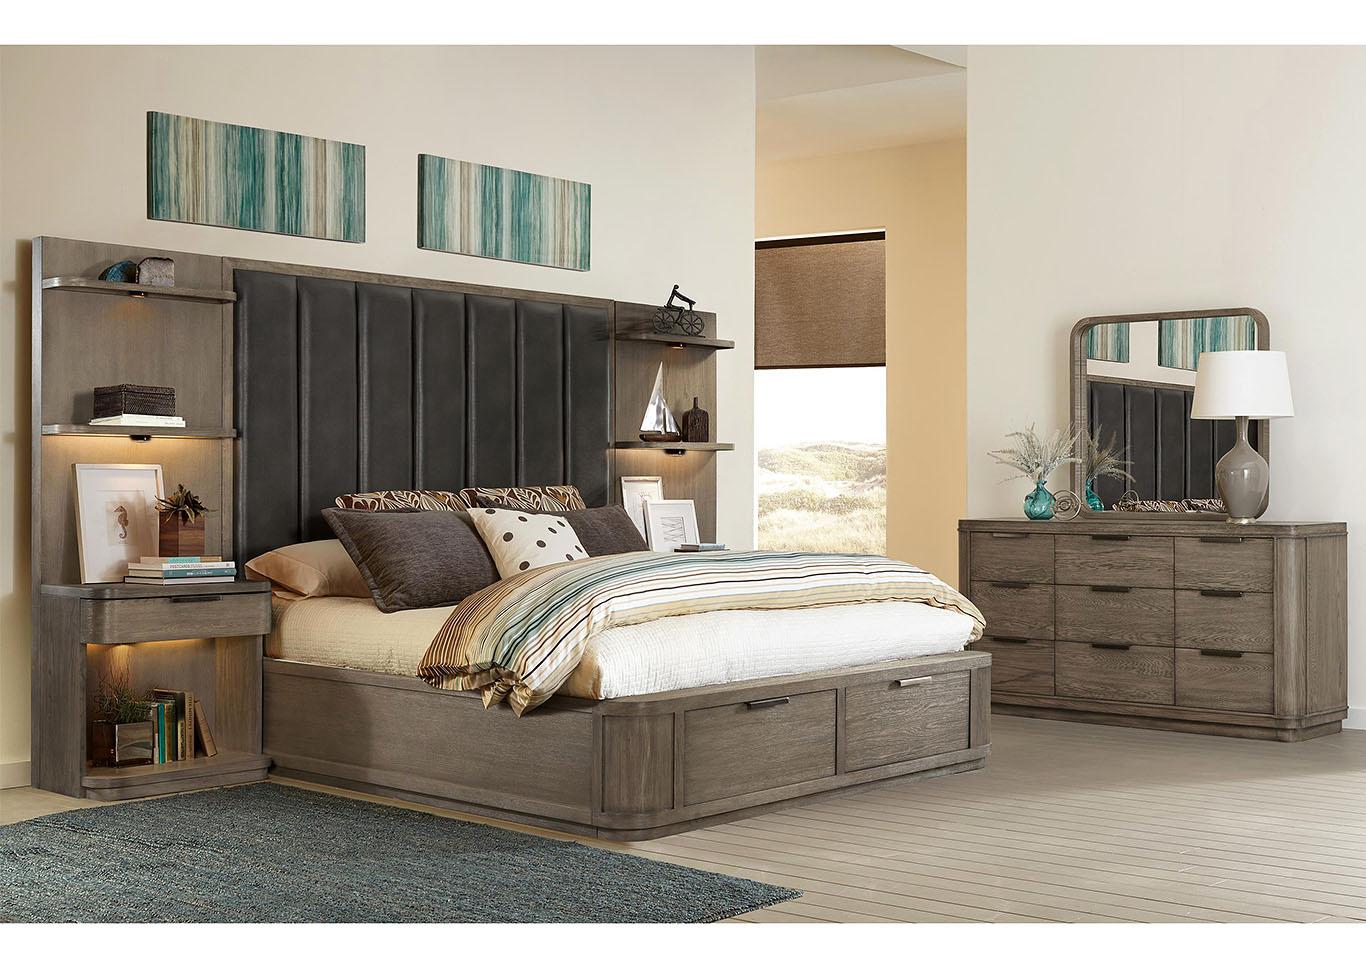 V. Watts Furniture Precision Gray Wash King Tall Upholstered ...